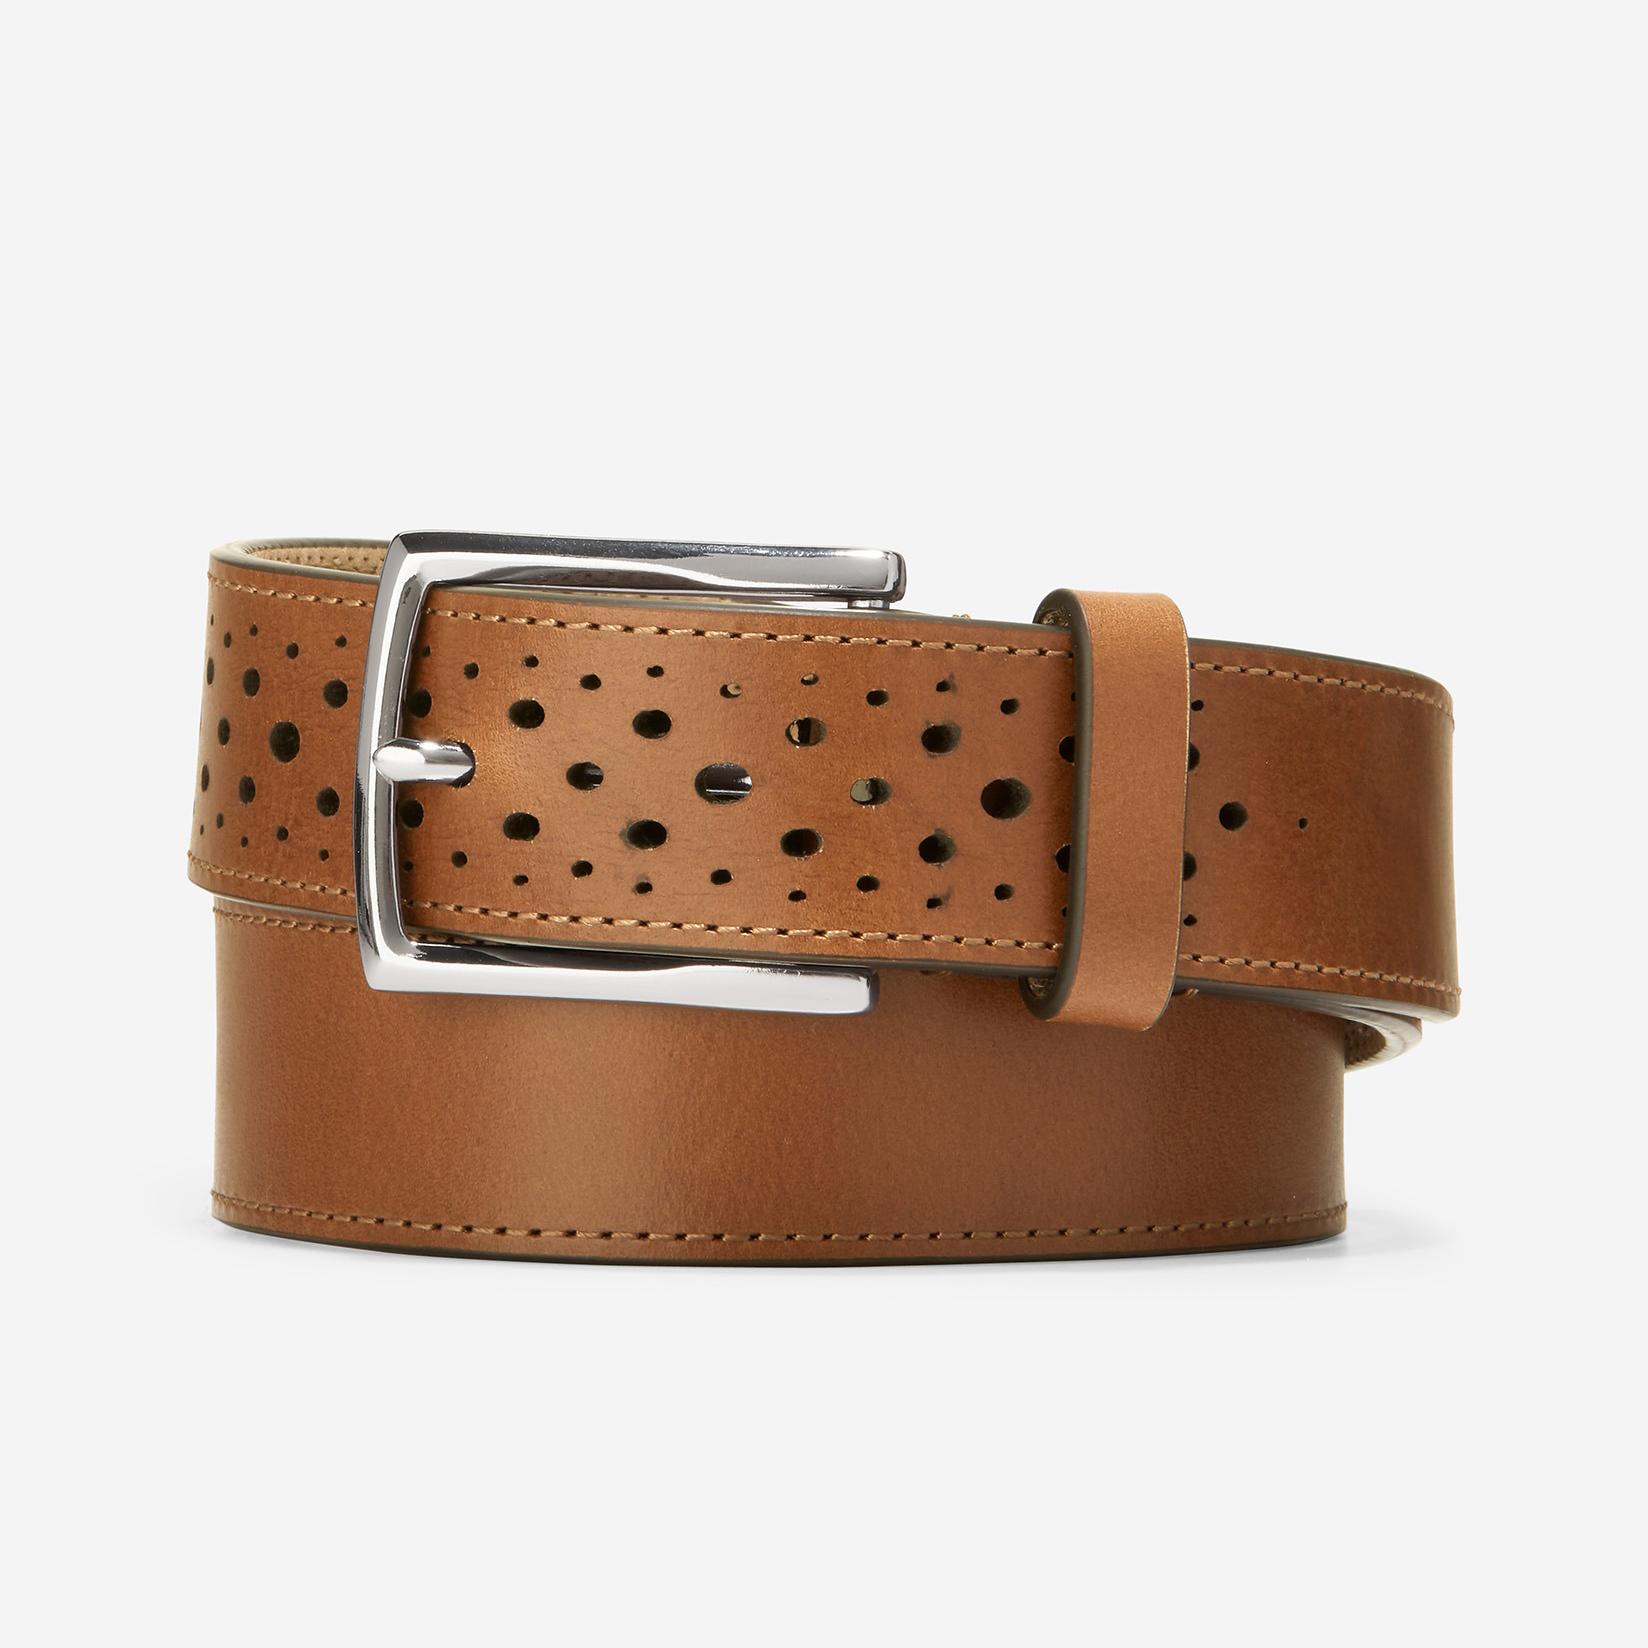 Cole Haan 32mm Washington Perforated Belt